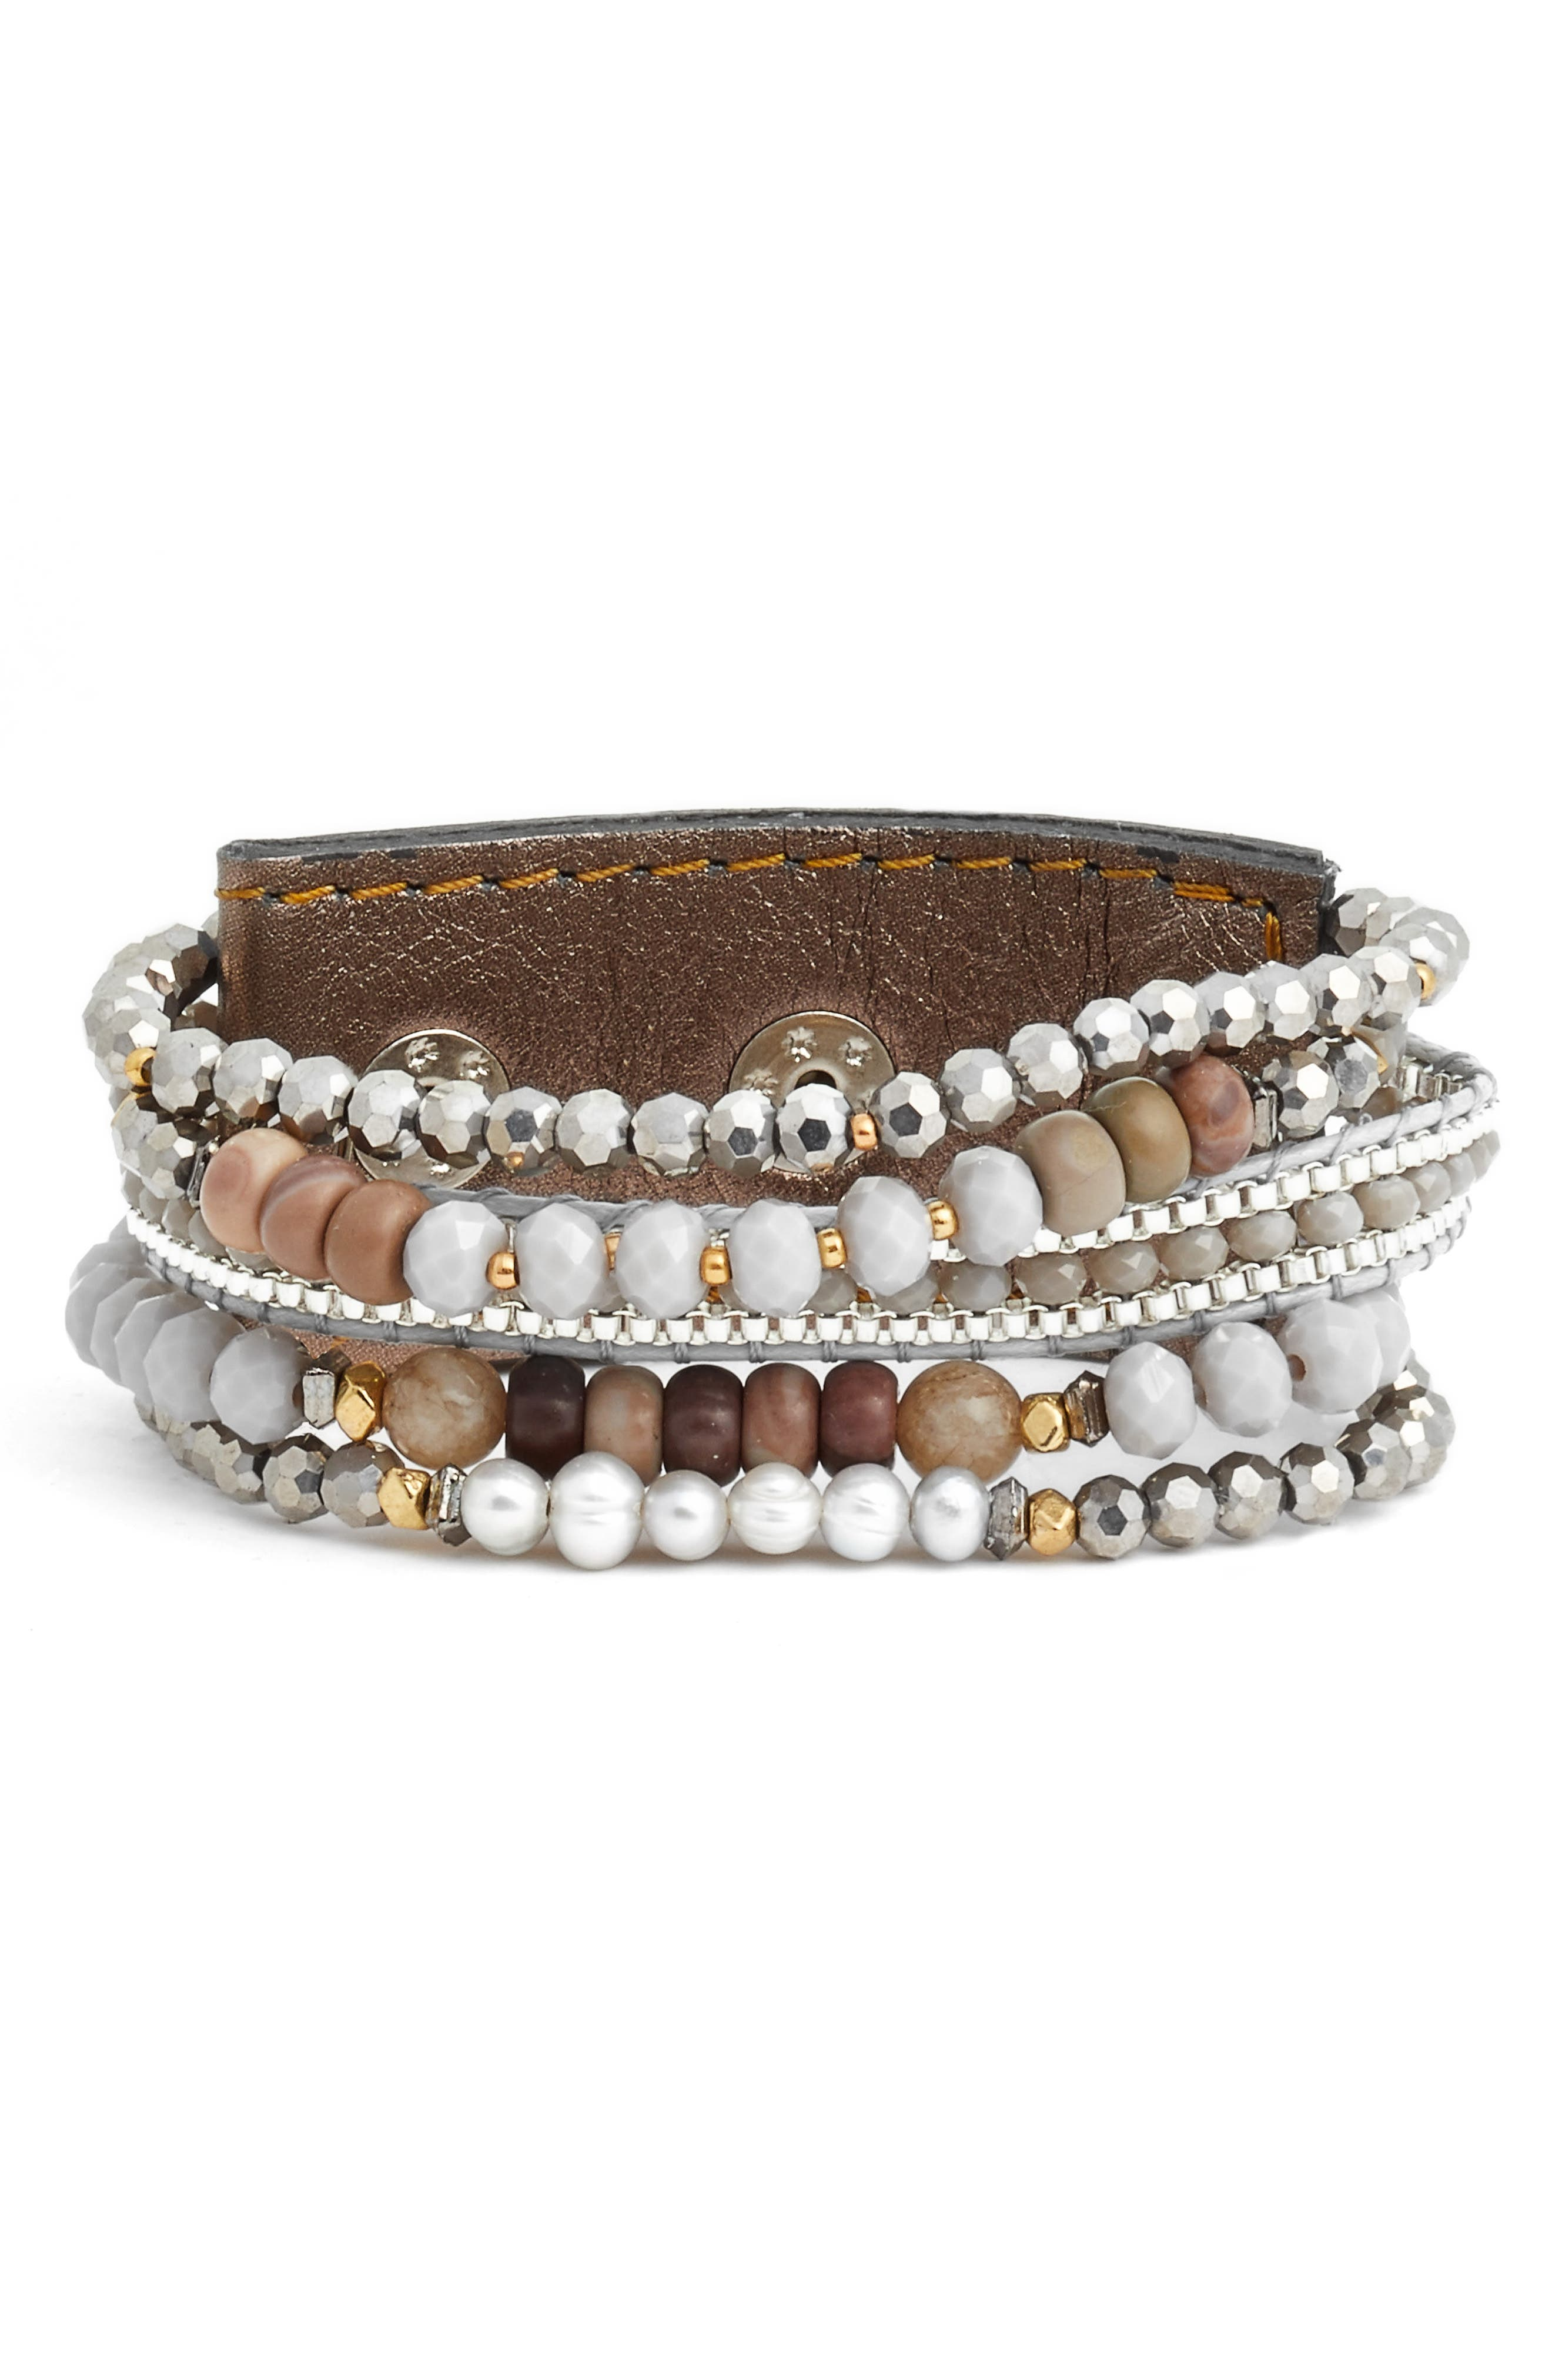 Main Image - Nakamol Design Beaded Wrap Bracelet